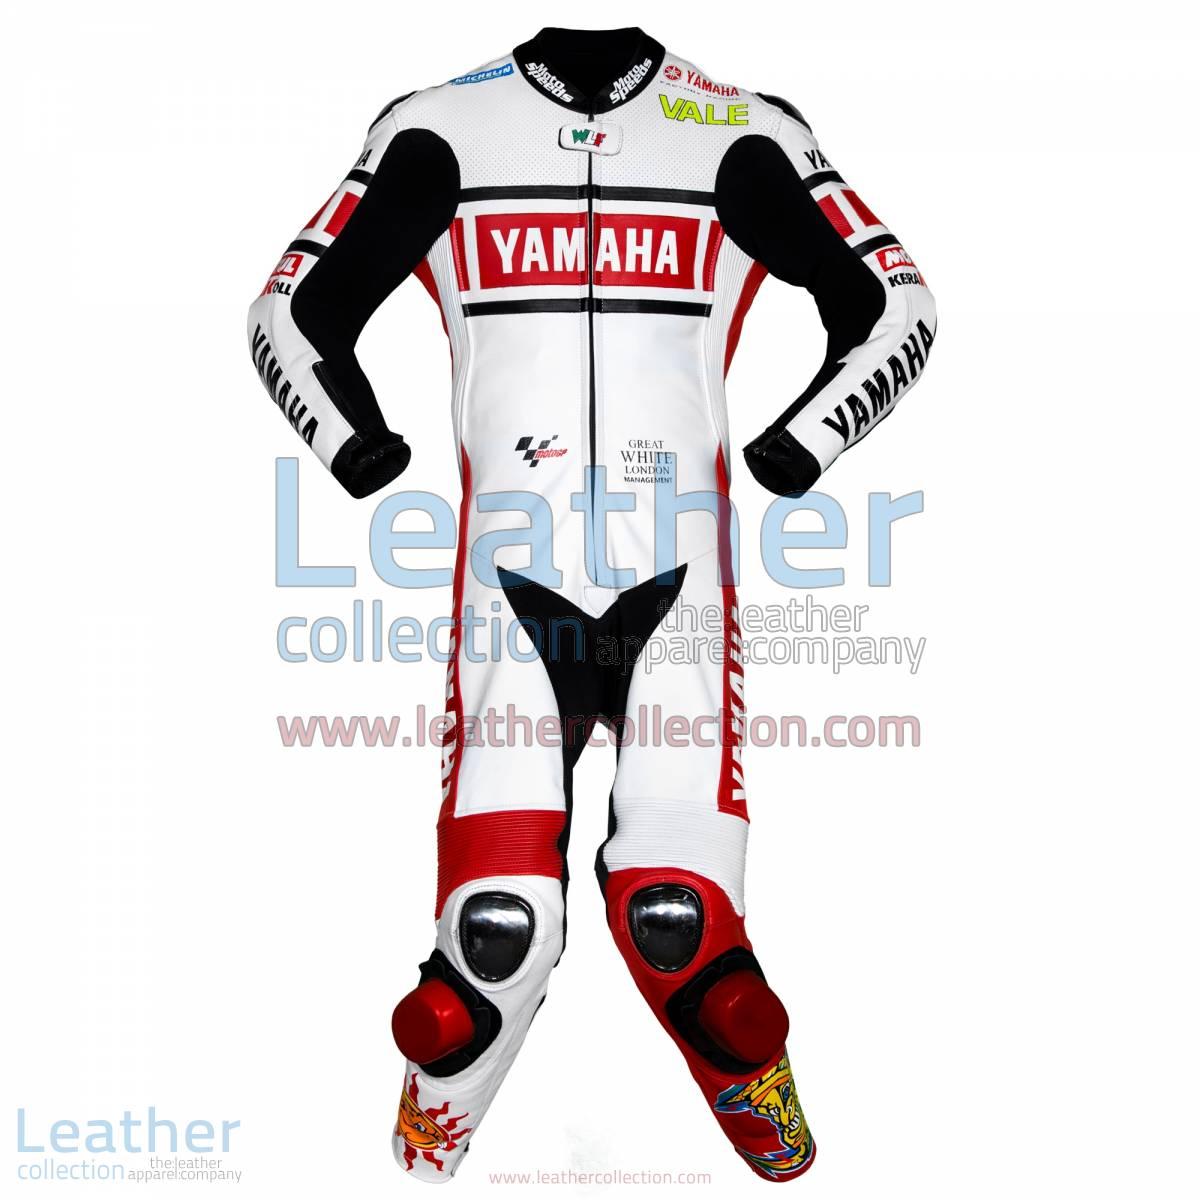 Valentino Rossi Yamaha MotoGP (Spain) 2005 Leathers | valentino rossi leathers